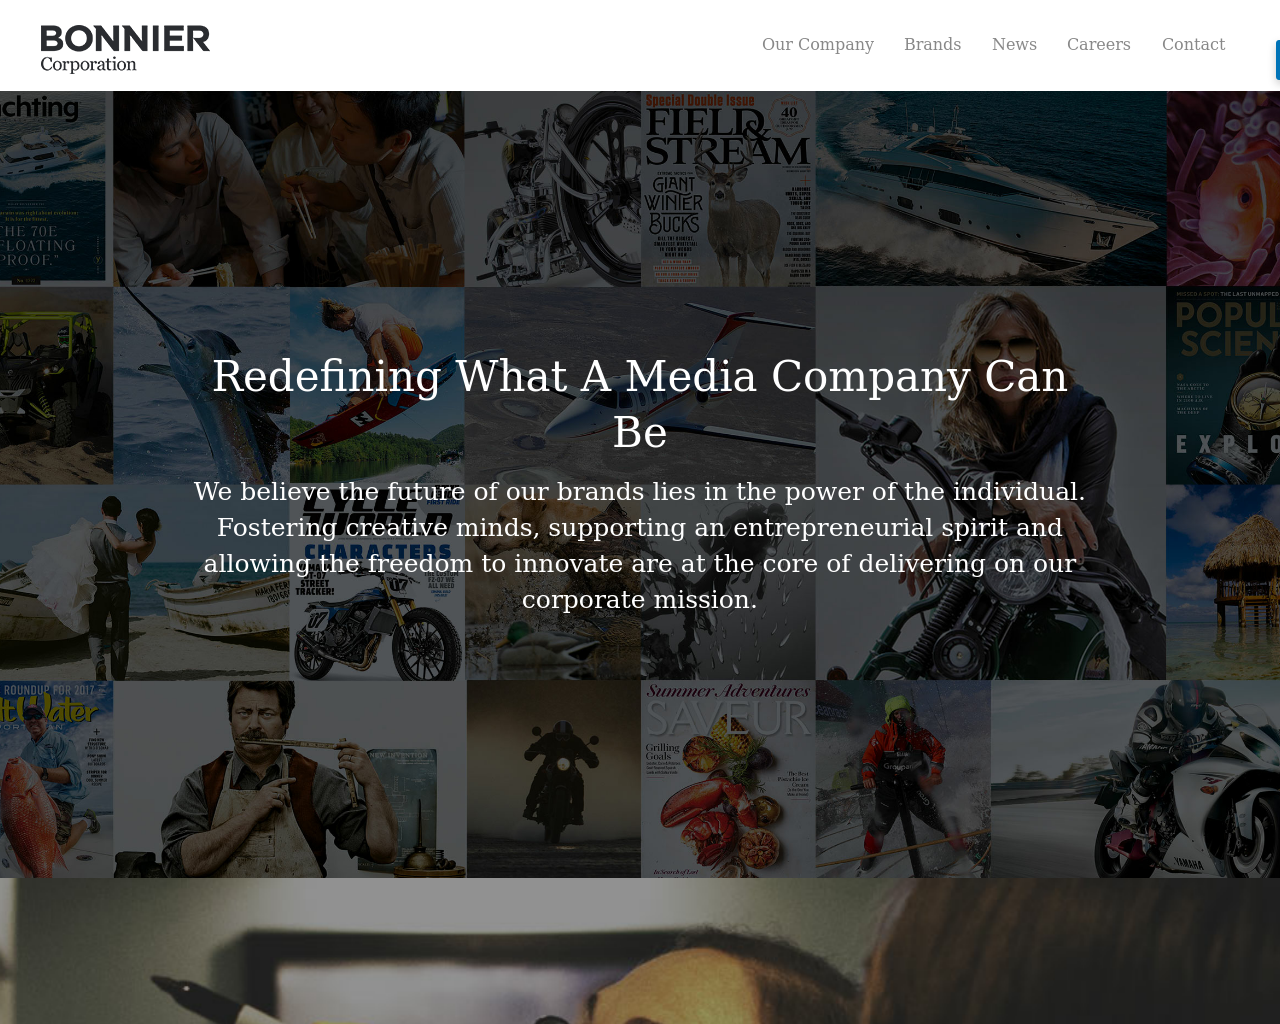 Bonnier-Corporation-Advertising-Reviews-Pricing